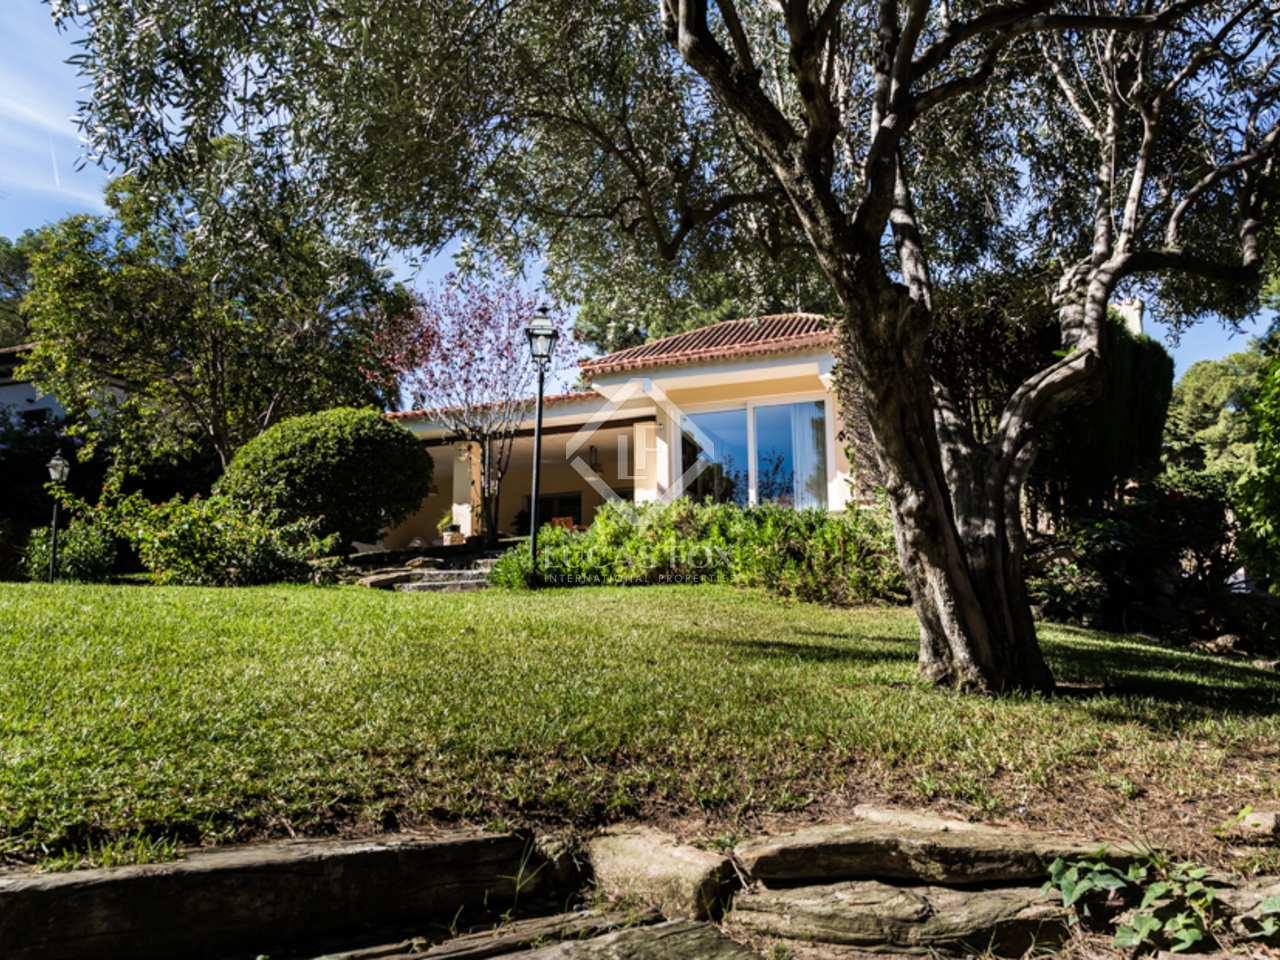 Villa en vente godella 10 minutes de valence for Piscine jardin valence